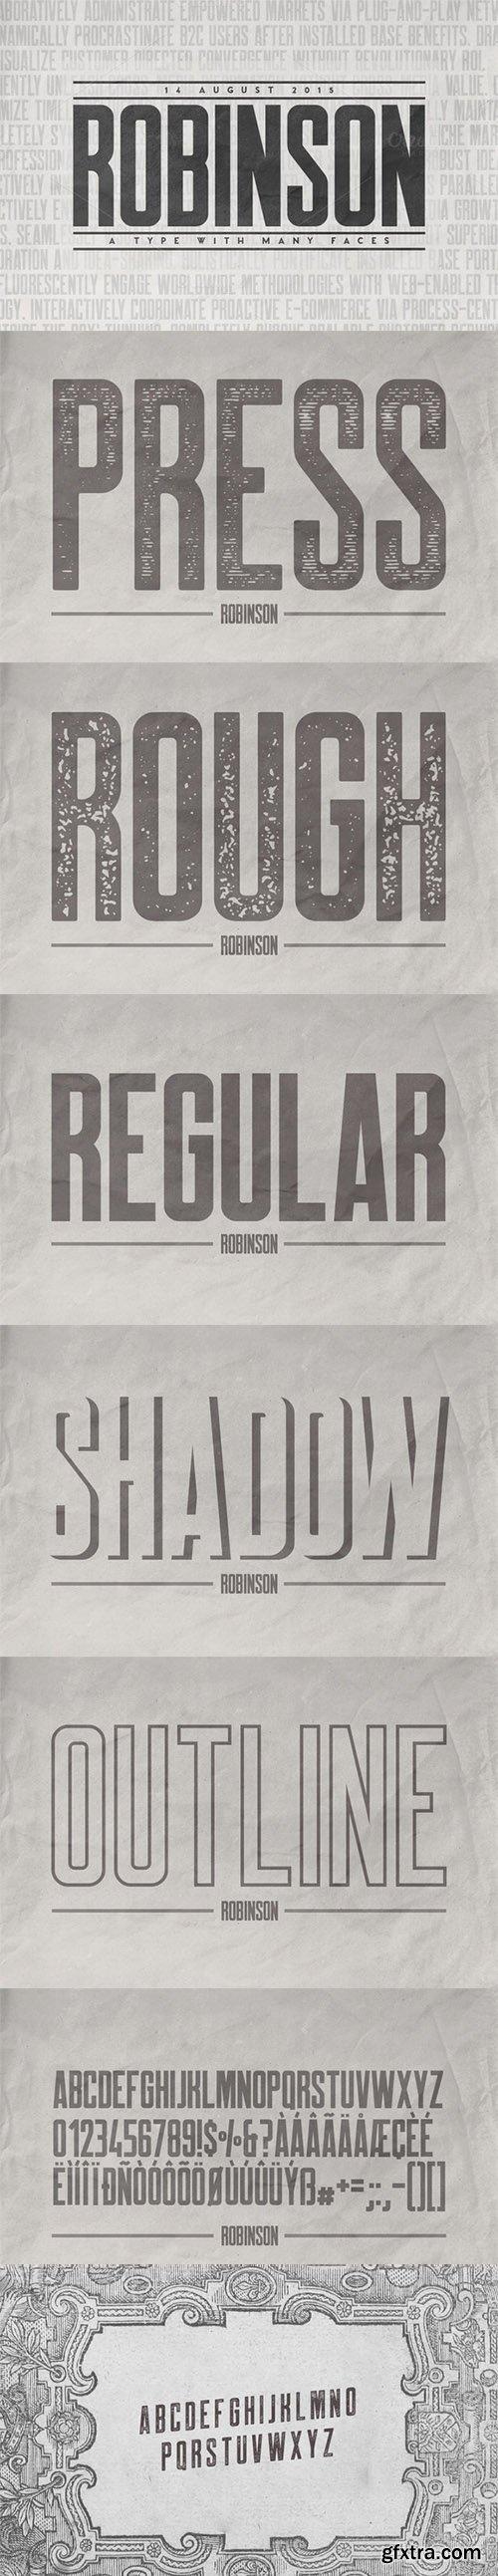 CM Robinson Typeface 18 Fonts 341318